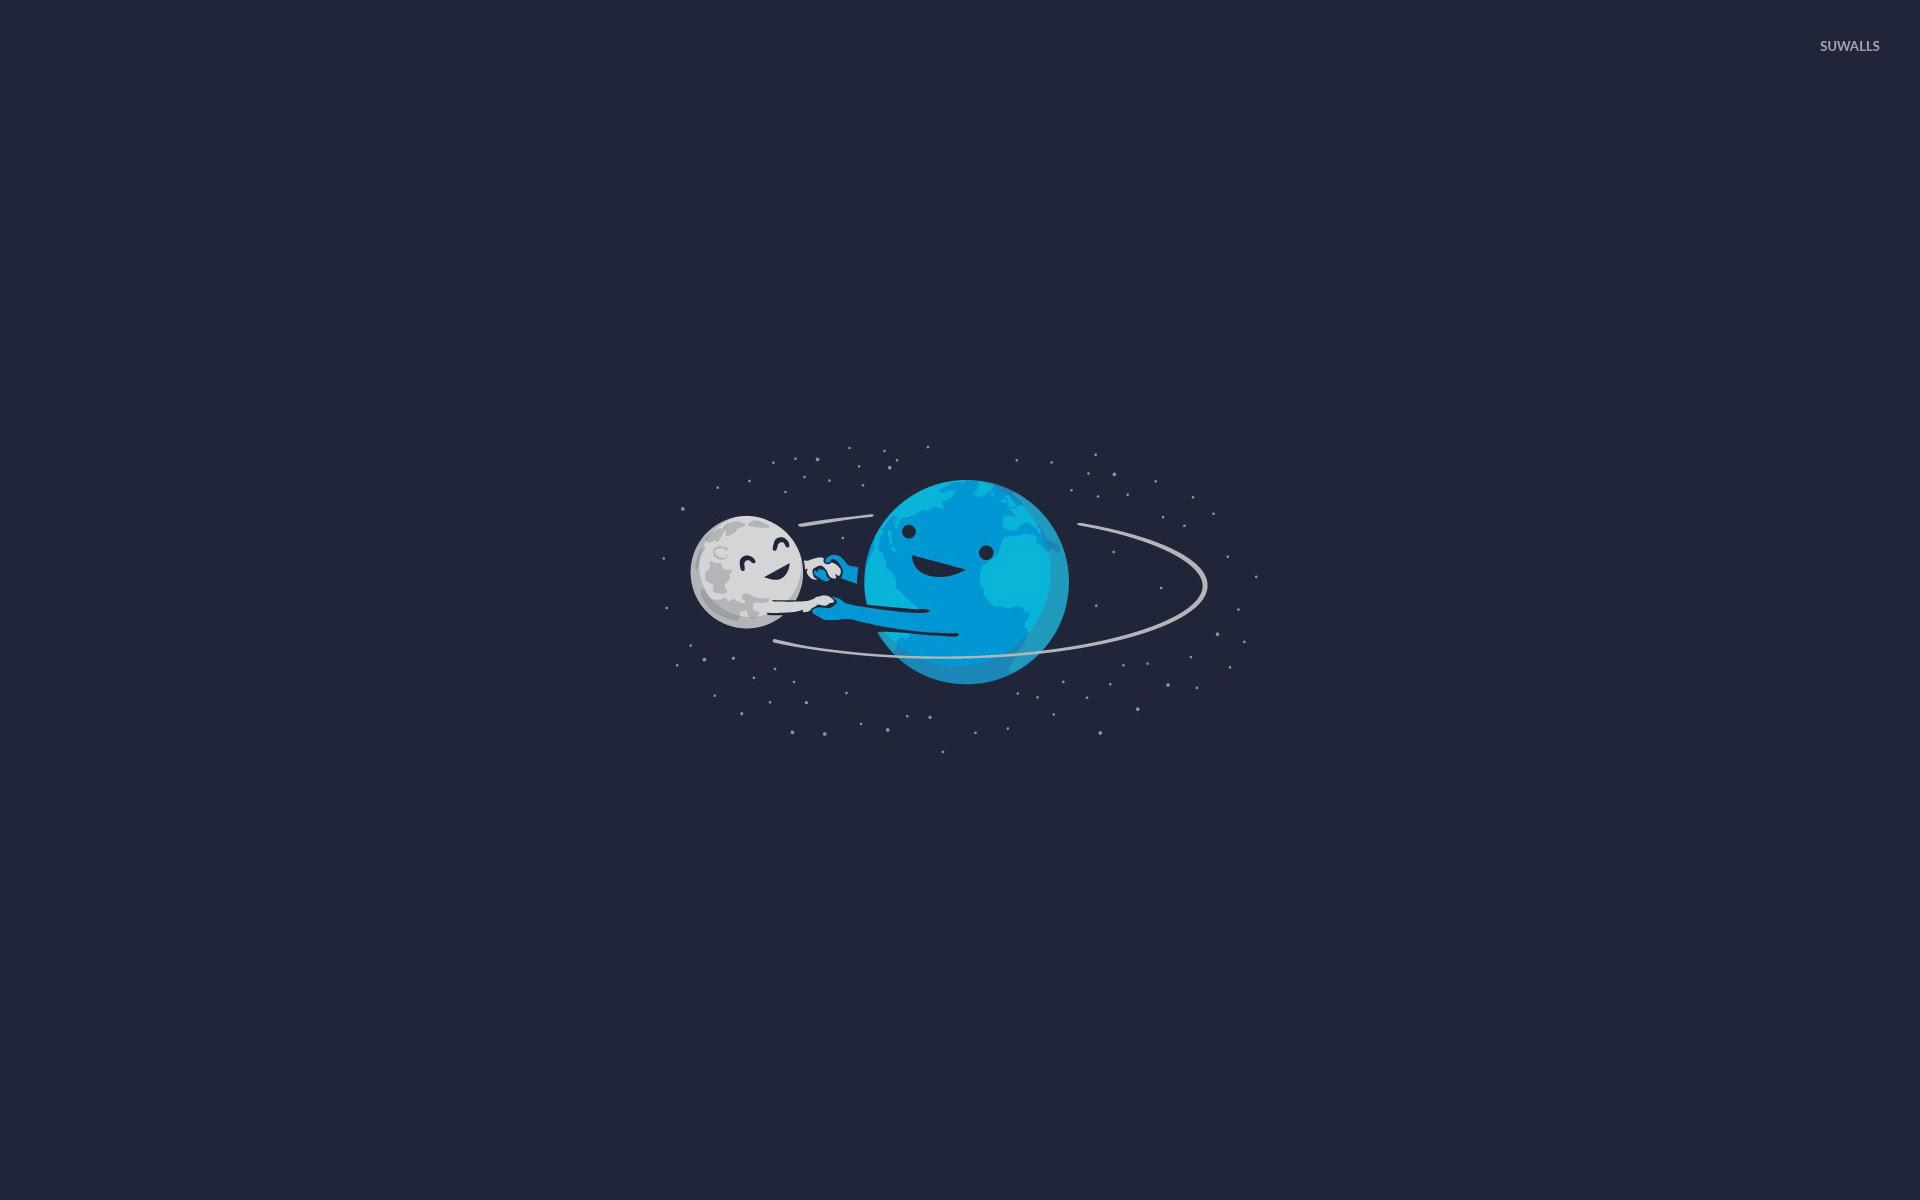 Earth and moon dancing wallpaper jpg